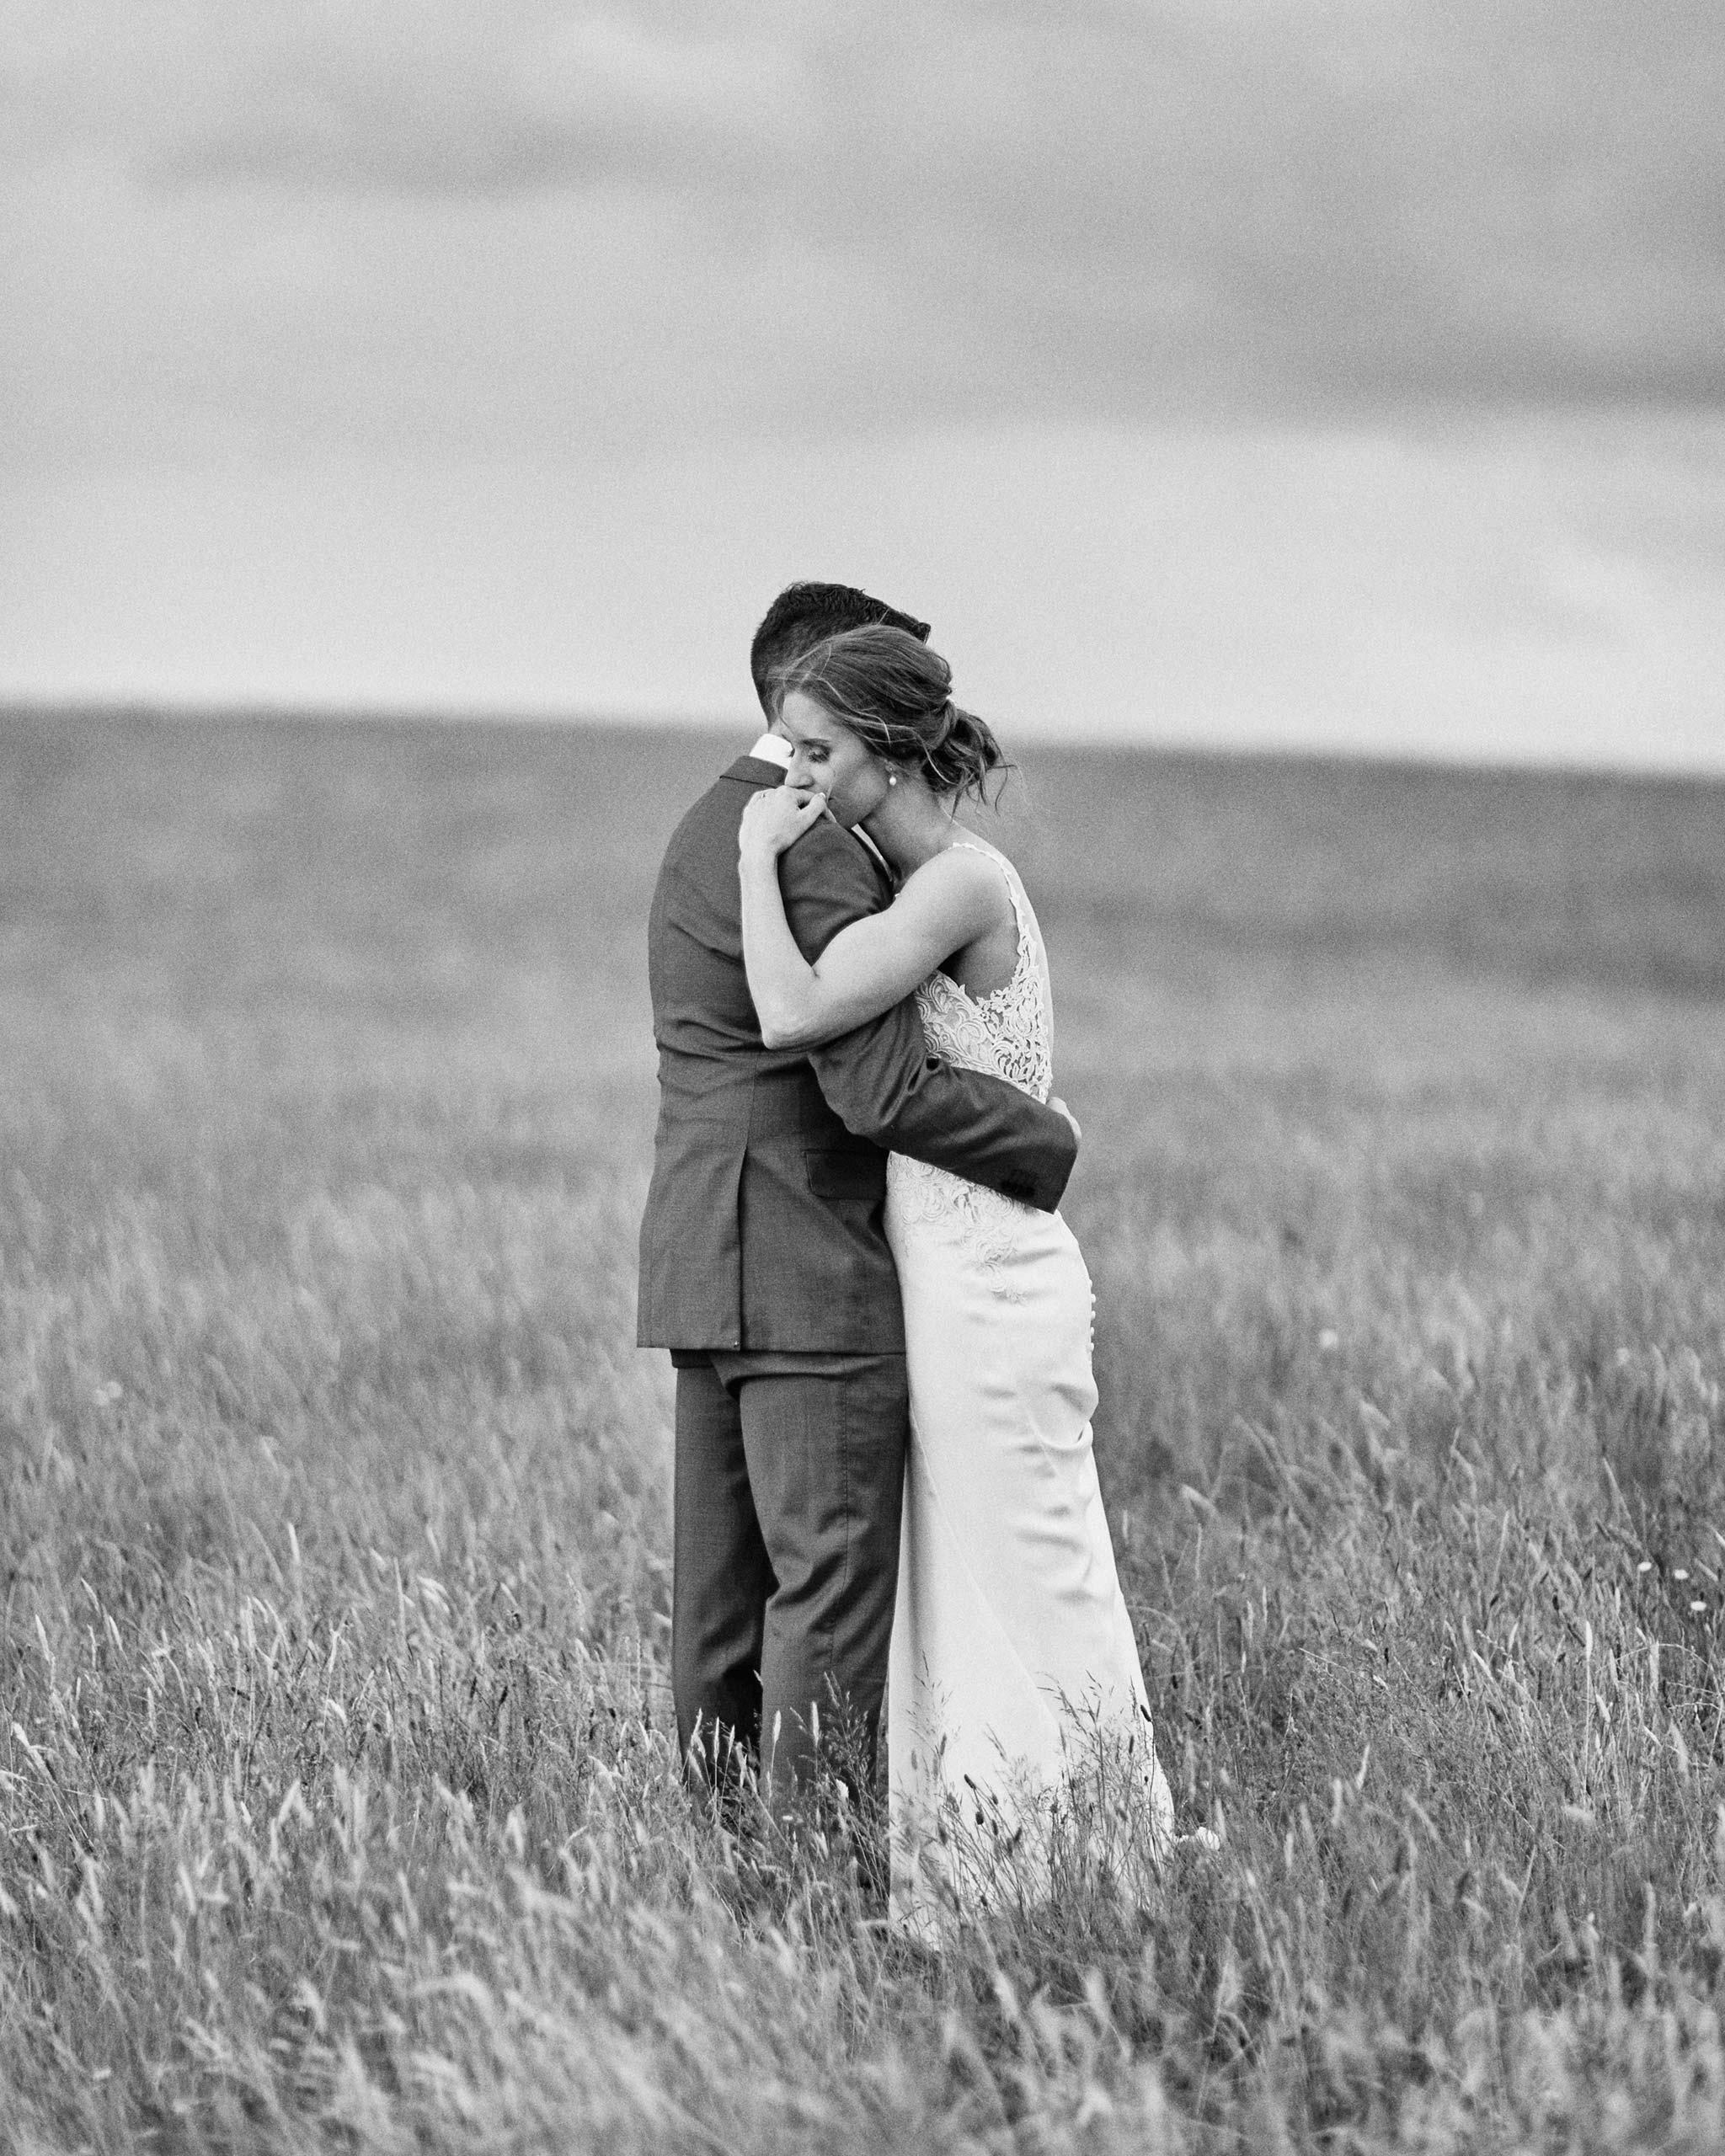 Zonzo estate wedding field couple embrace